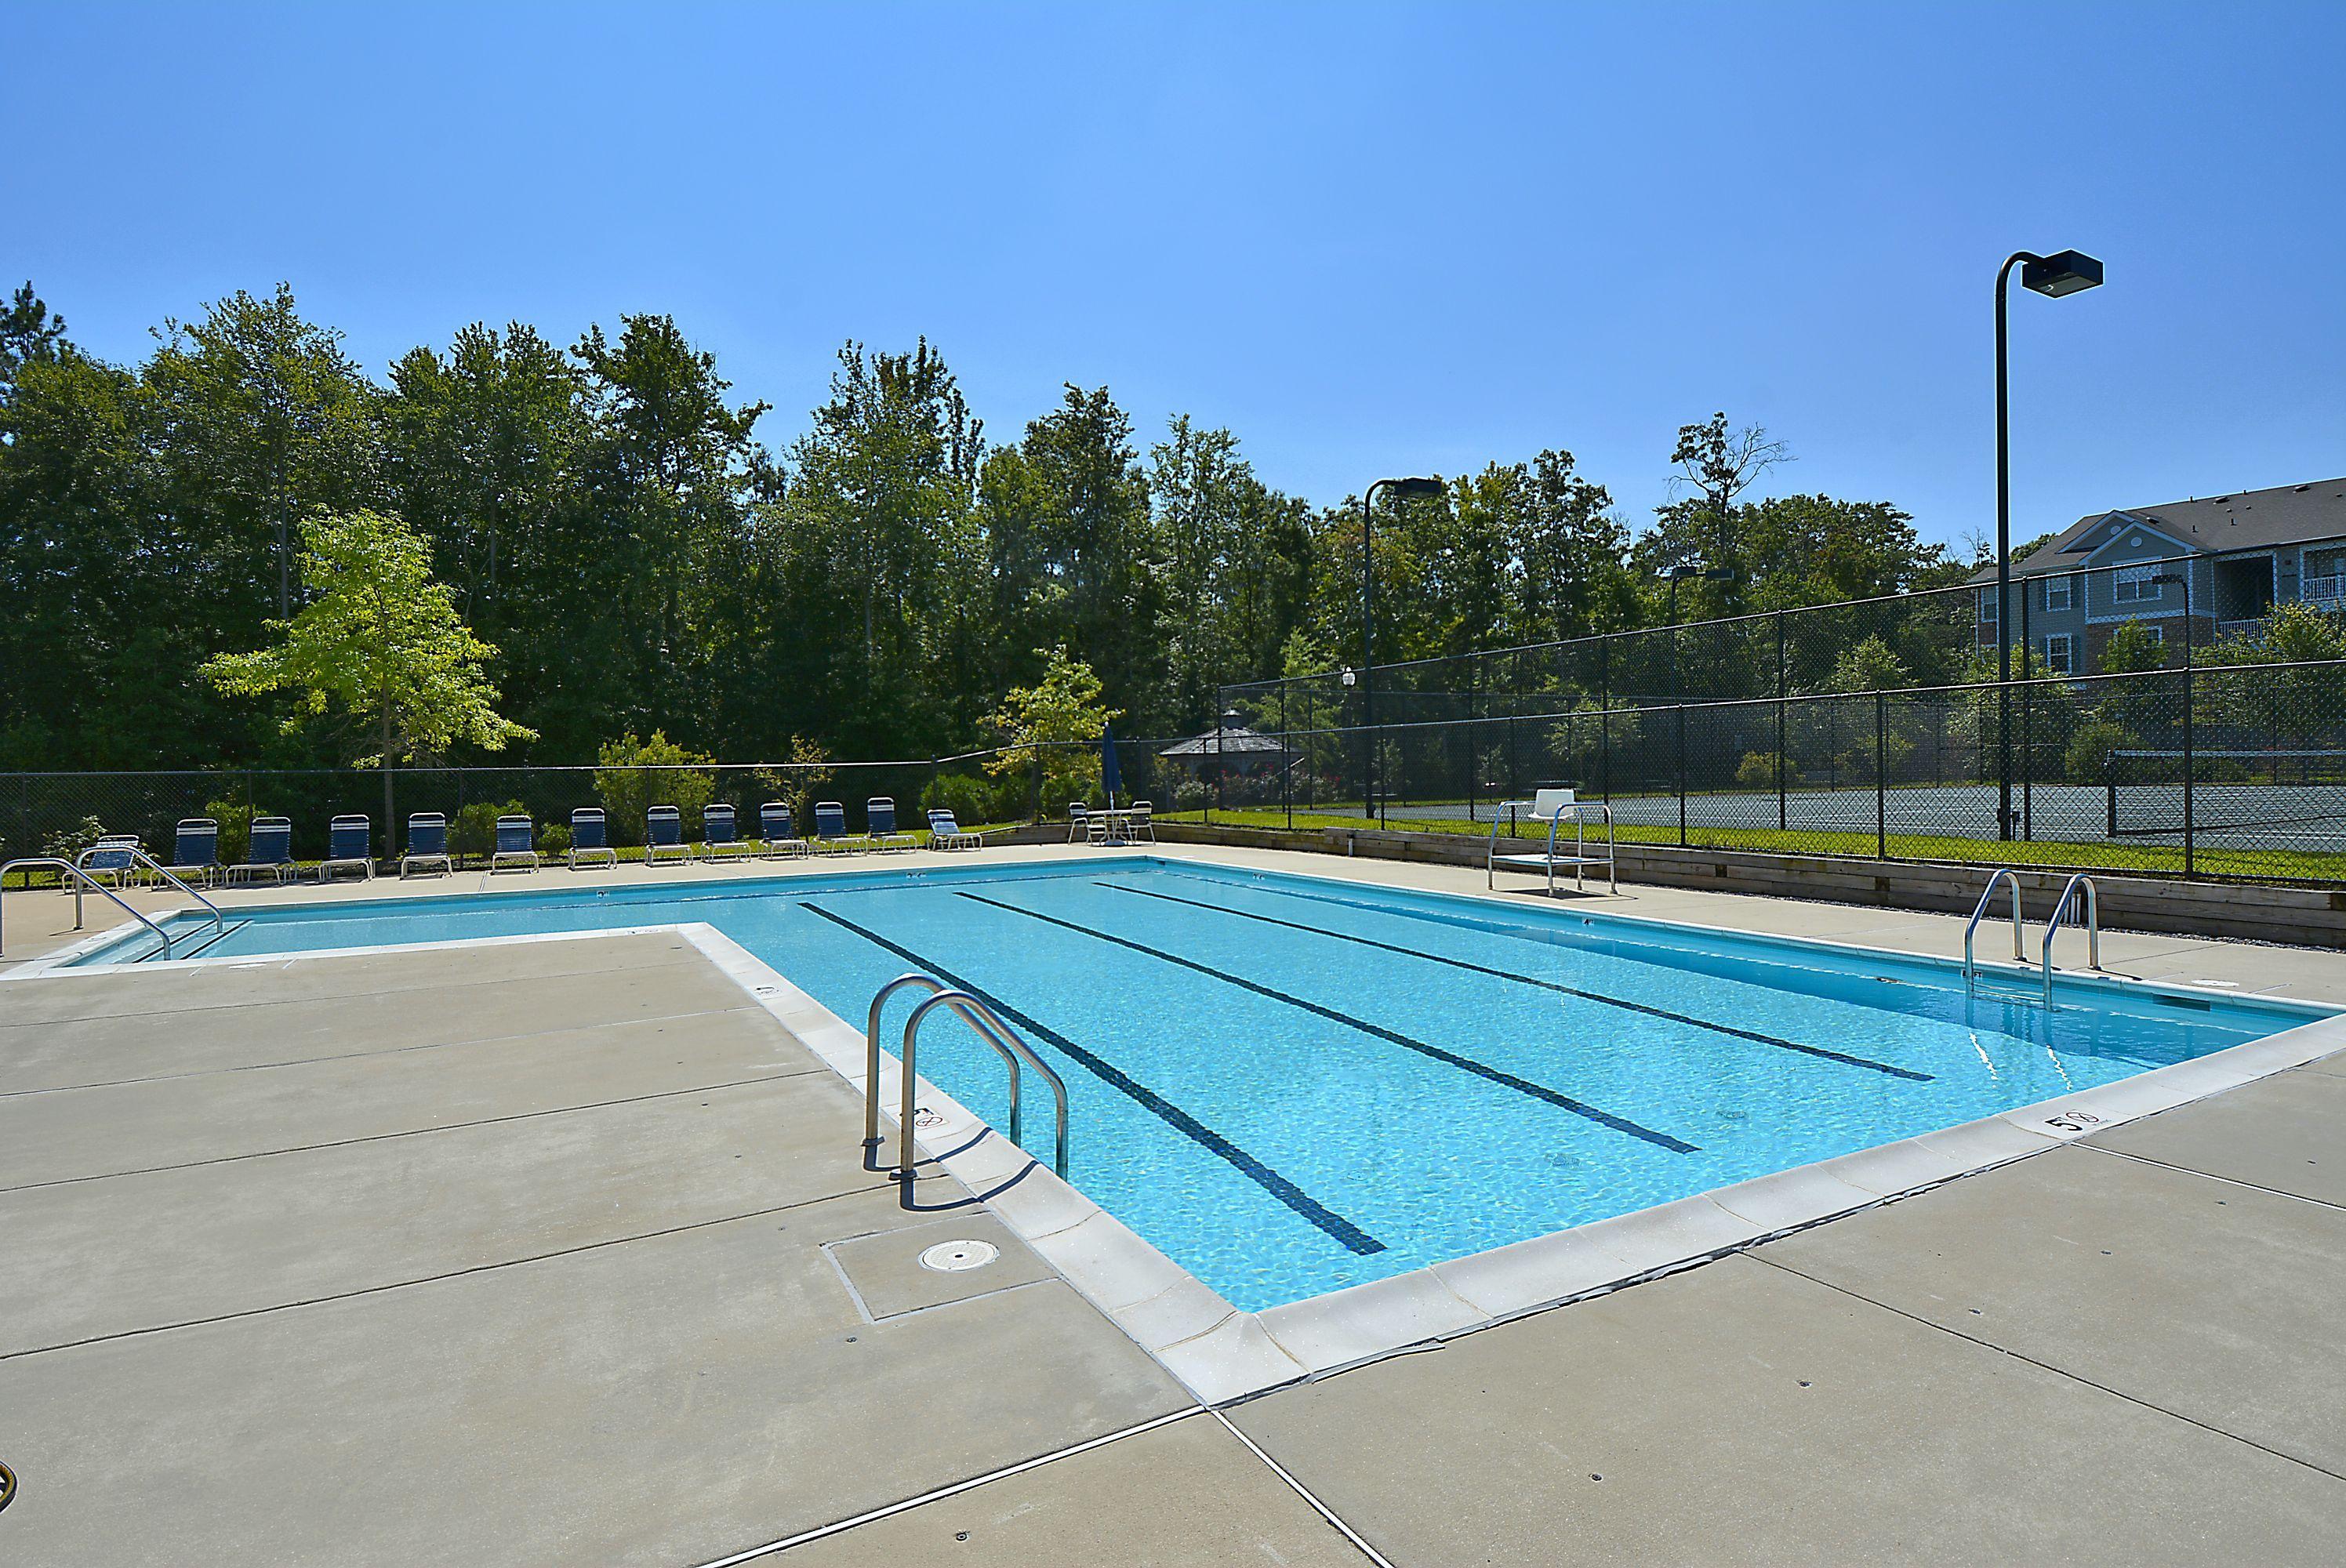 Seven Oaks Odenton tennis courts